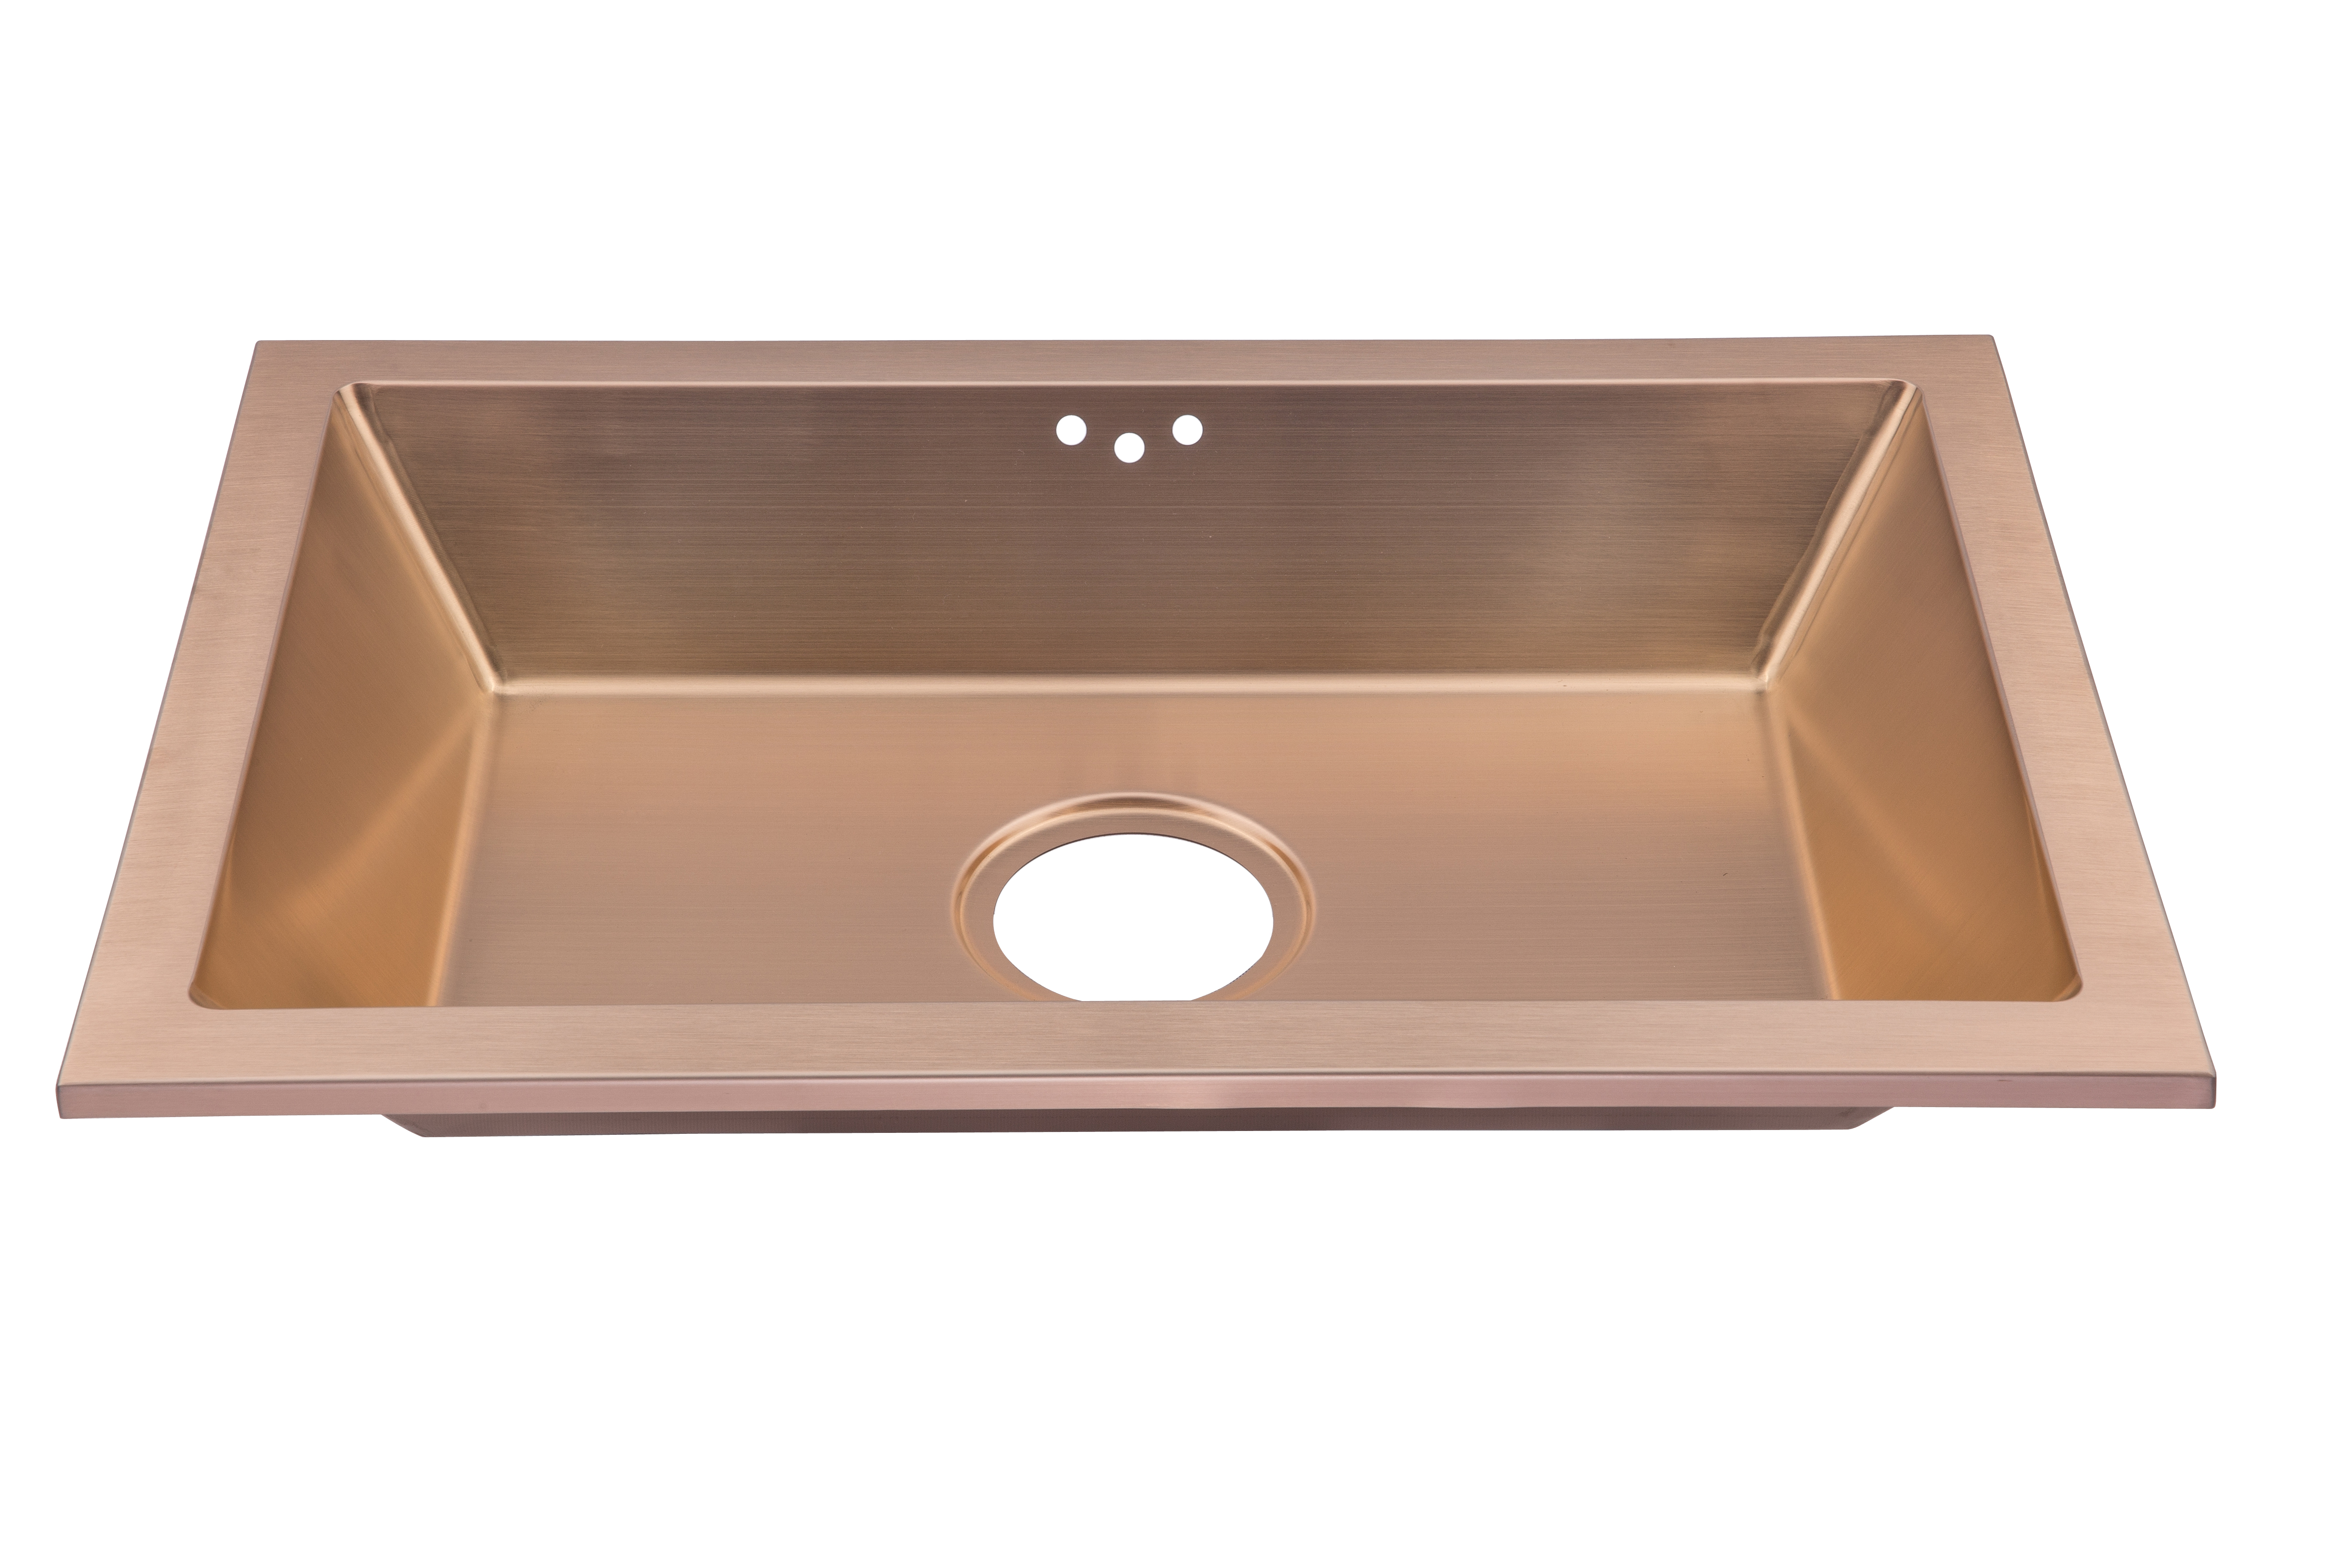 "Undermount Double Kitchen Sink AS360S 24"" x 15.63"" x 4"" 18G Single Bowl Dual Mount Legend ..."